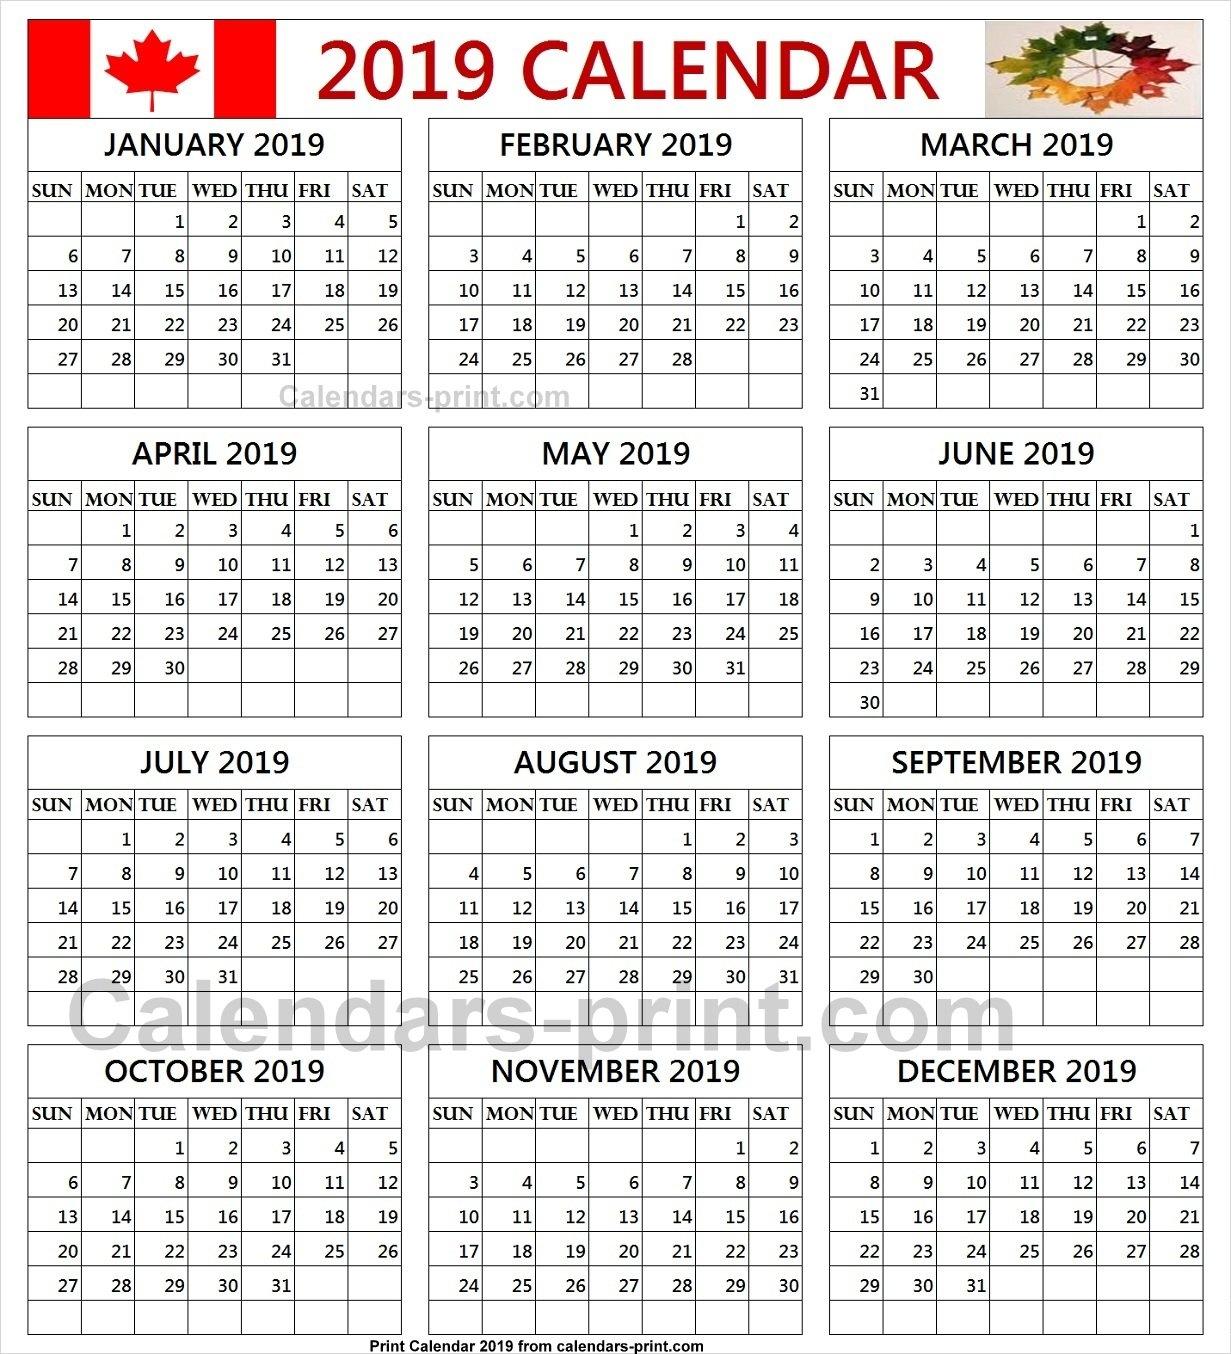 Free Calendar 2019 Canada Printable Template With Notes | Holidays Calendar Year 2019 Canada